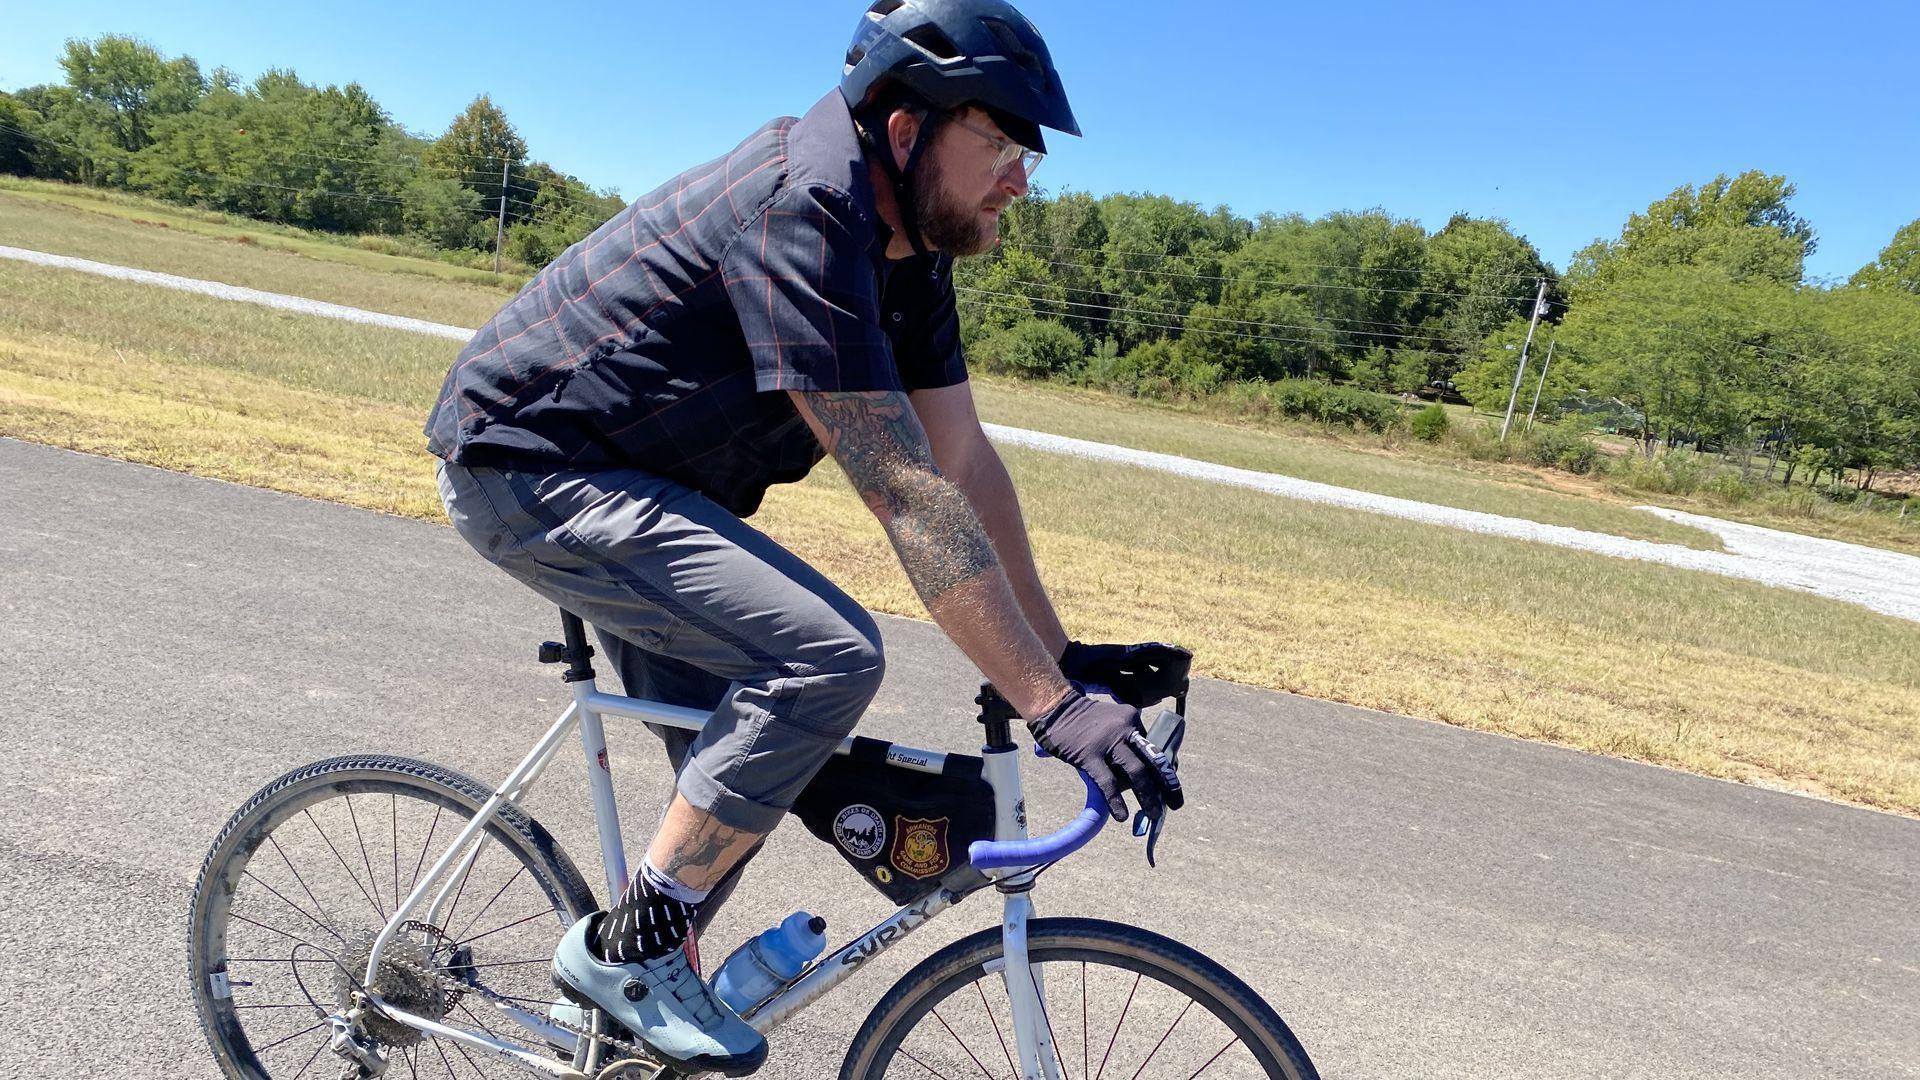 A man rides a bike on a cyclo-cross course.